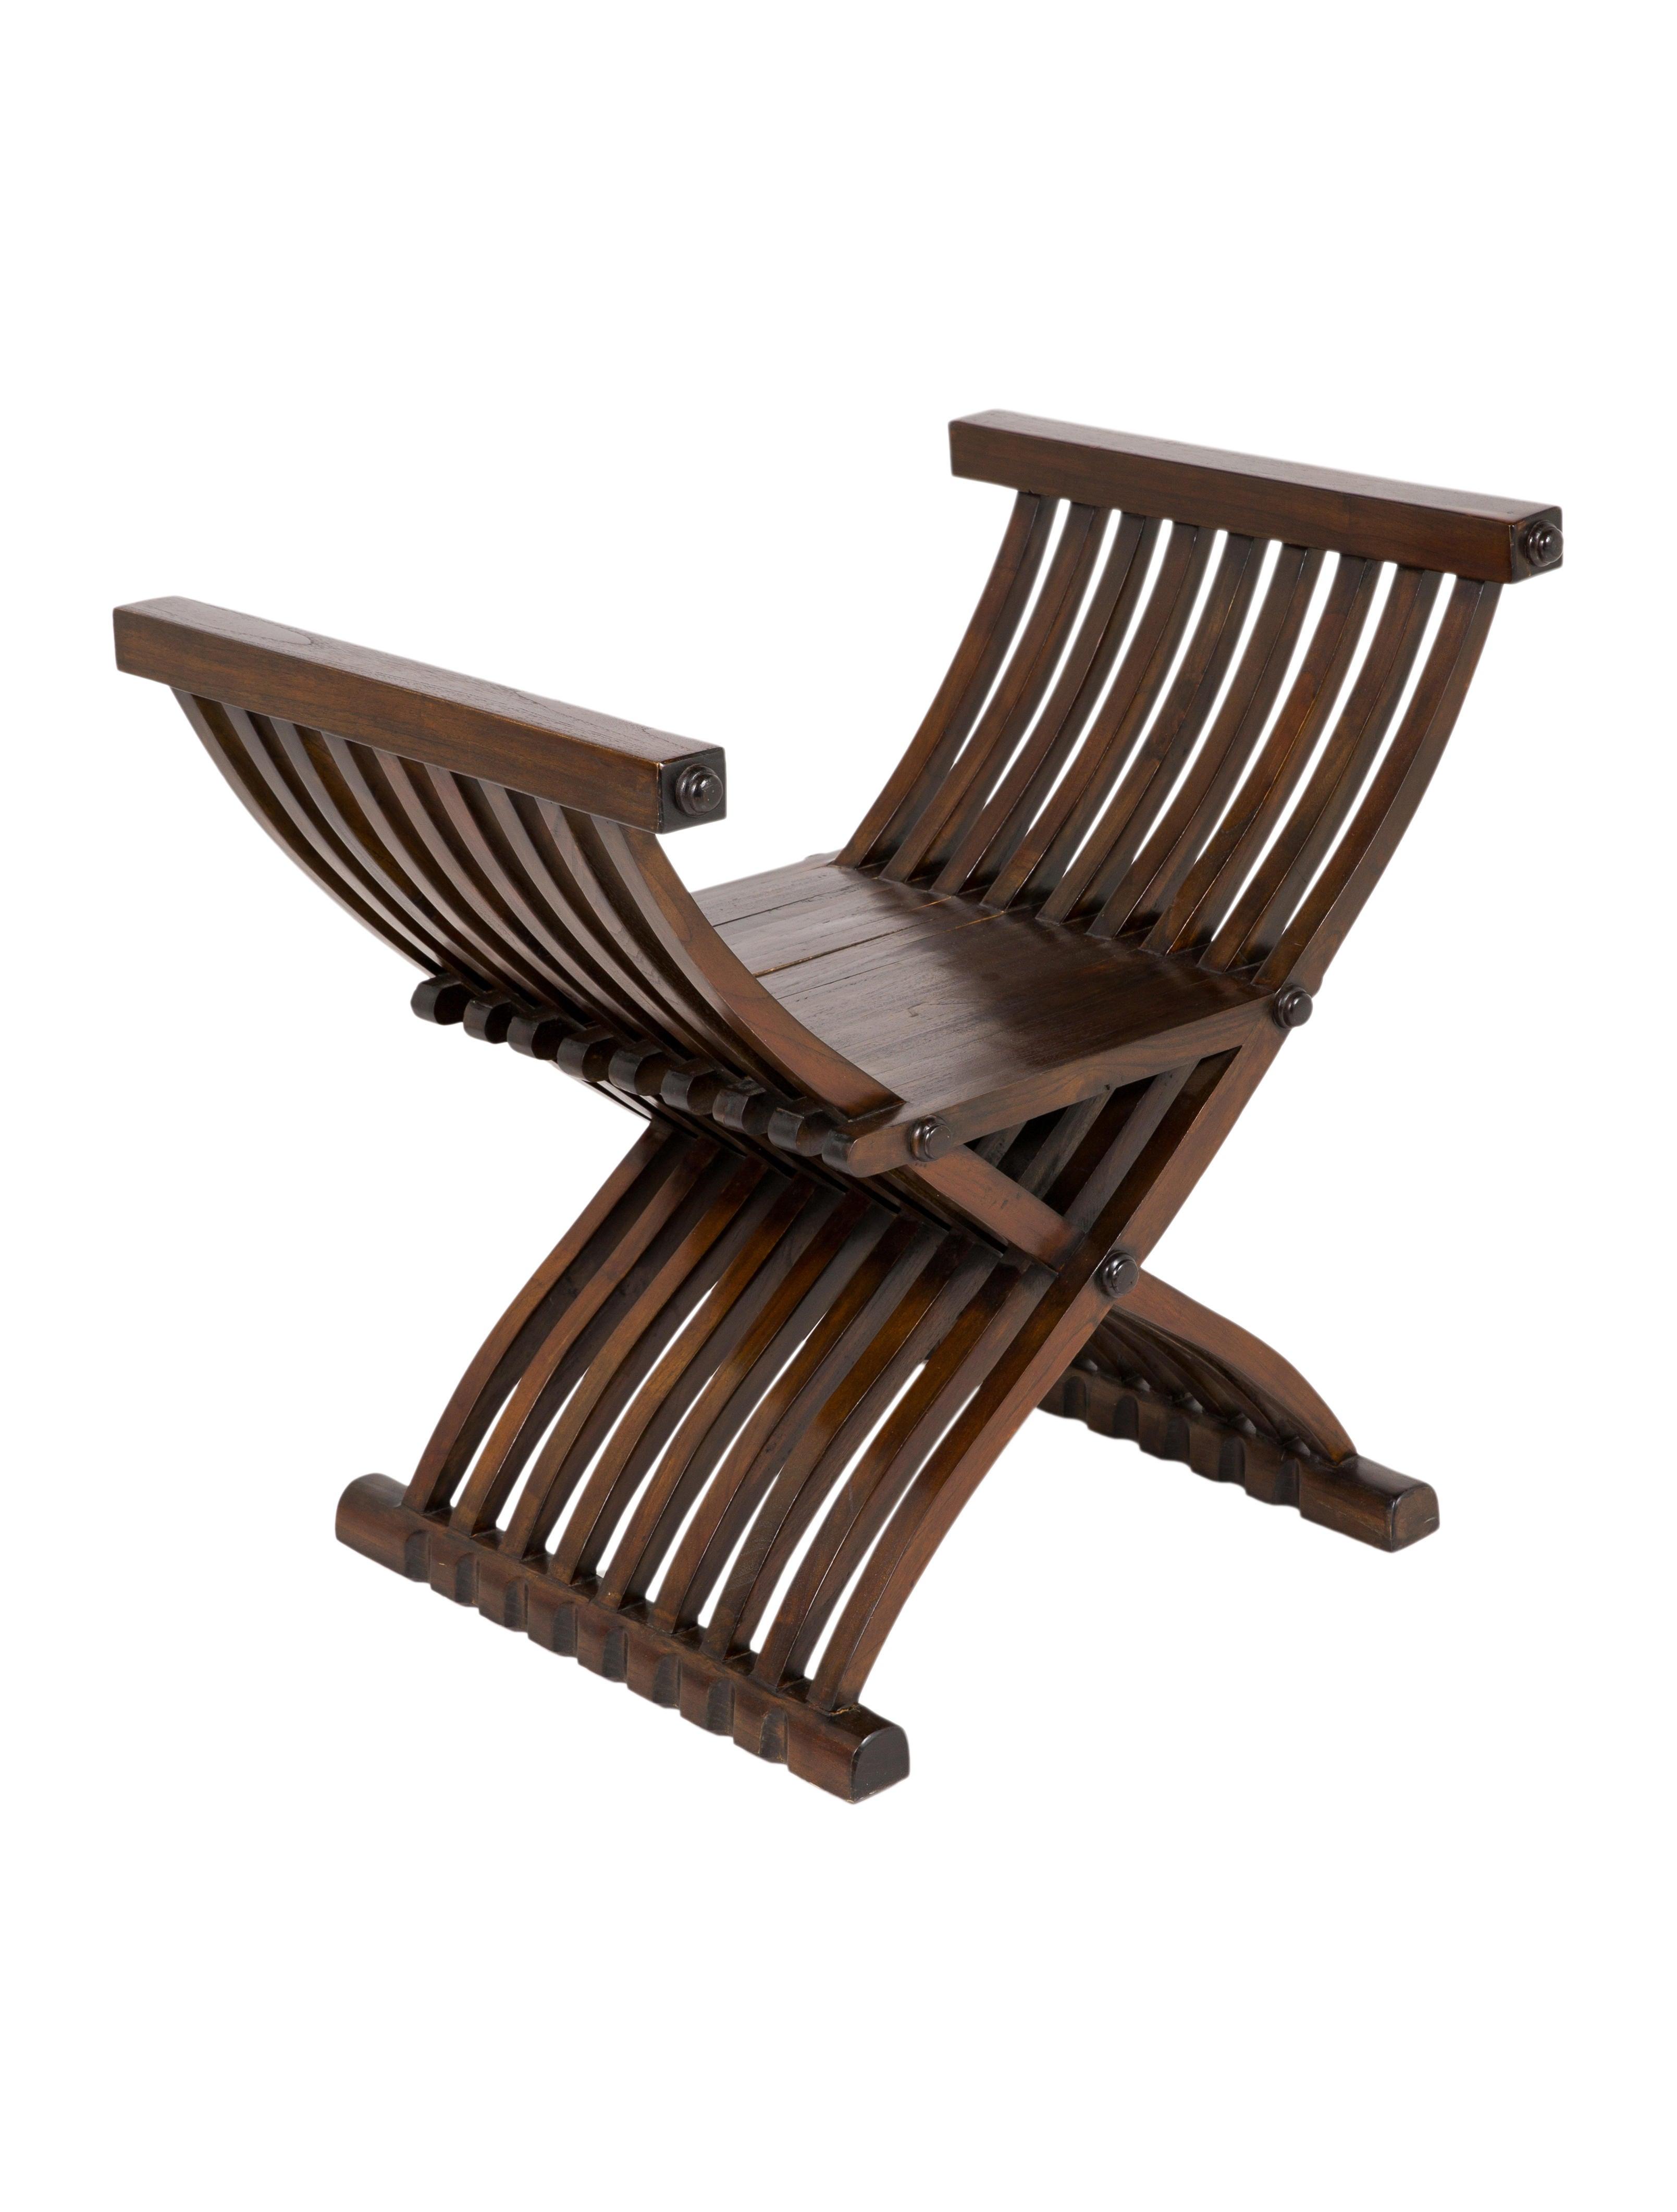 Noir Curule Chair Furniture Chair20473 The Realreal